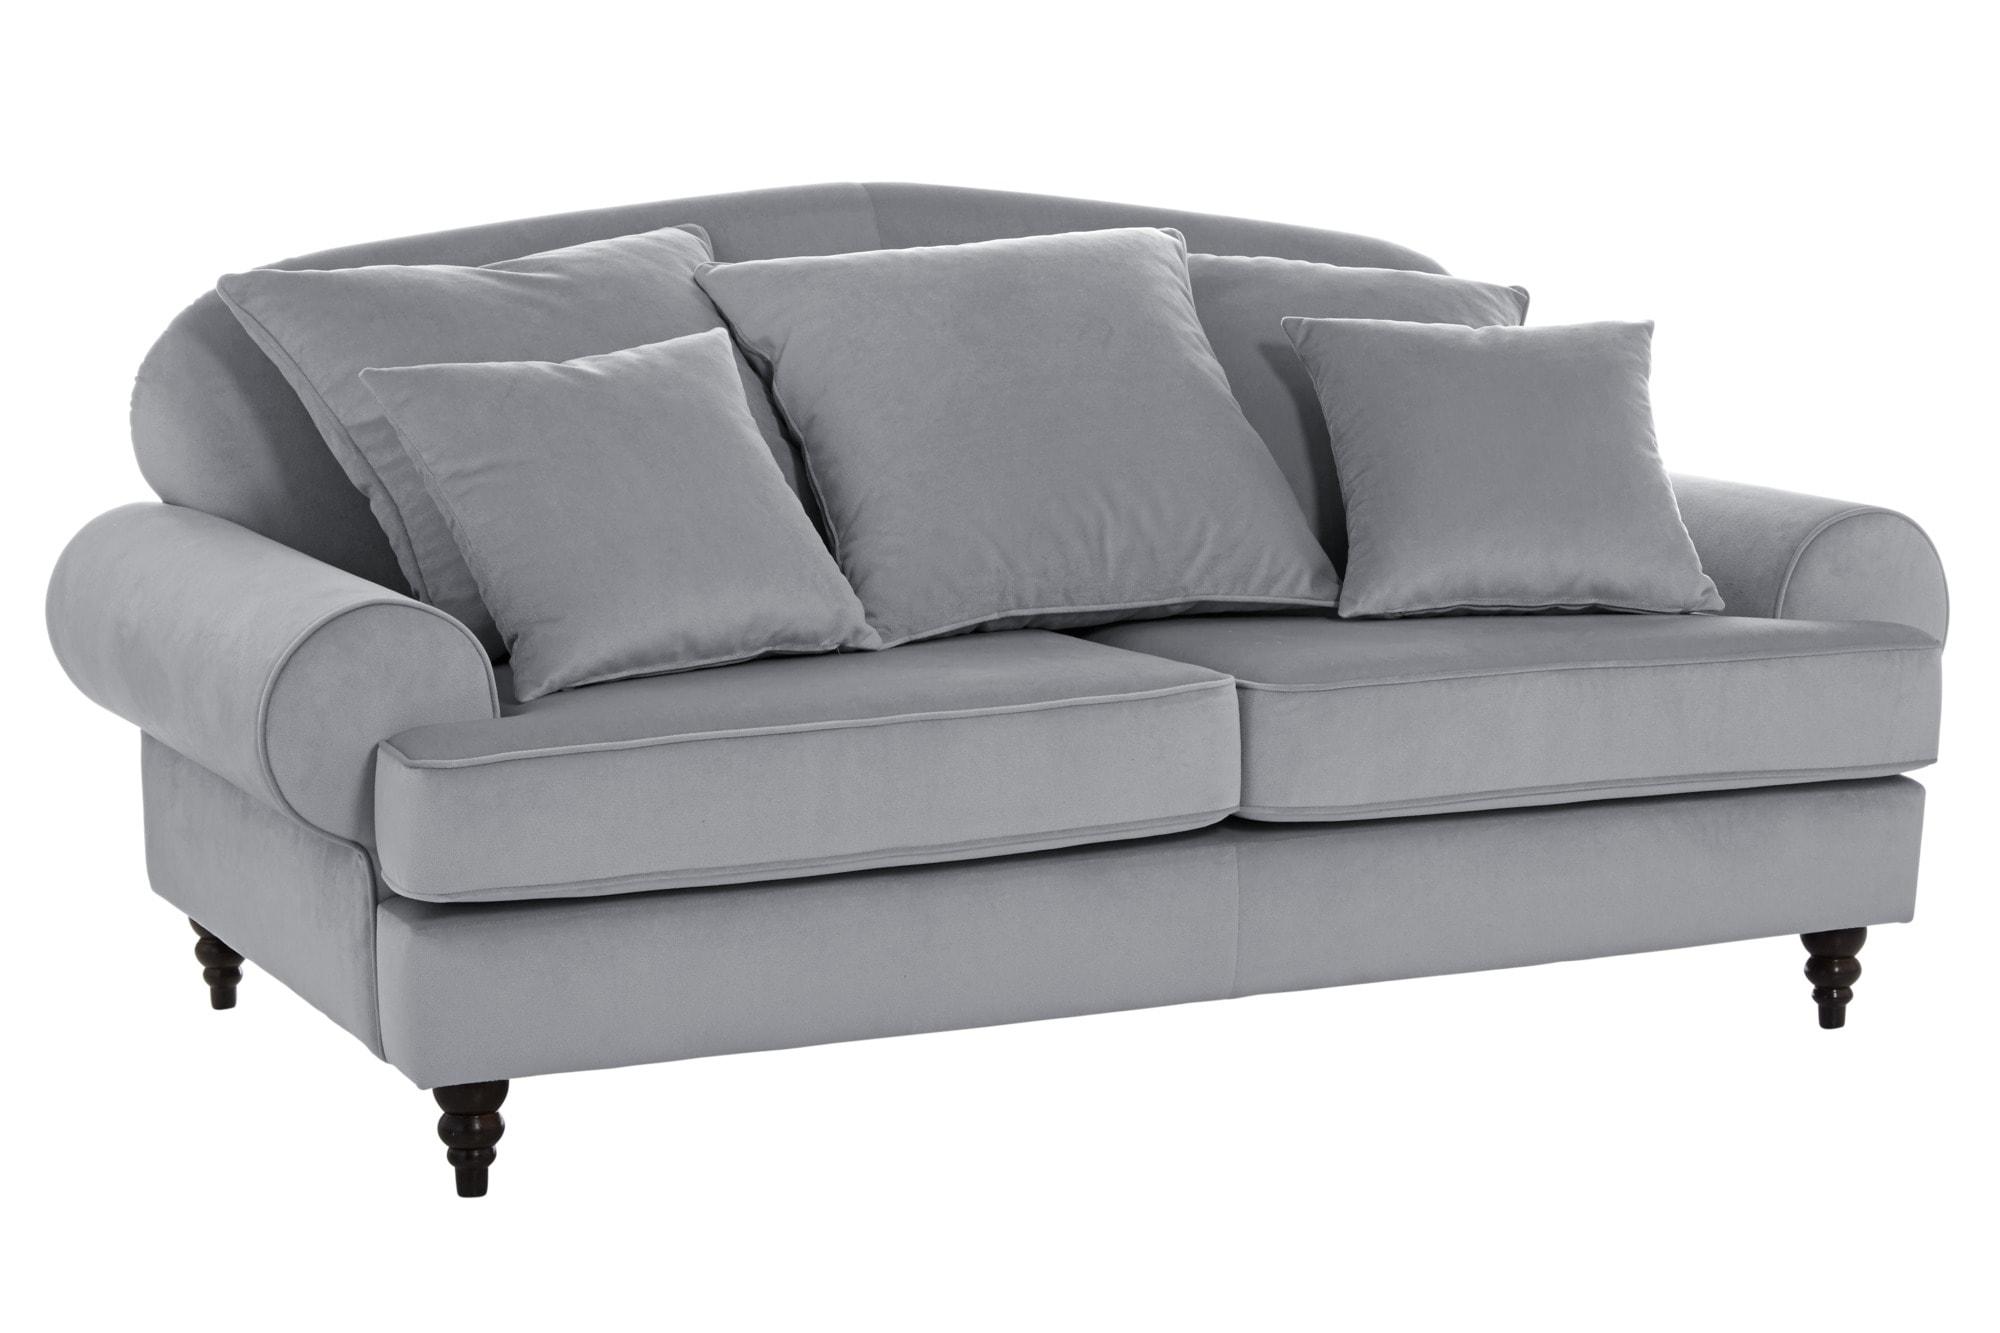 heine home 2-Sitzer-Sofa Bezug in Samt-Optik